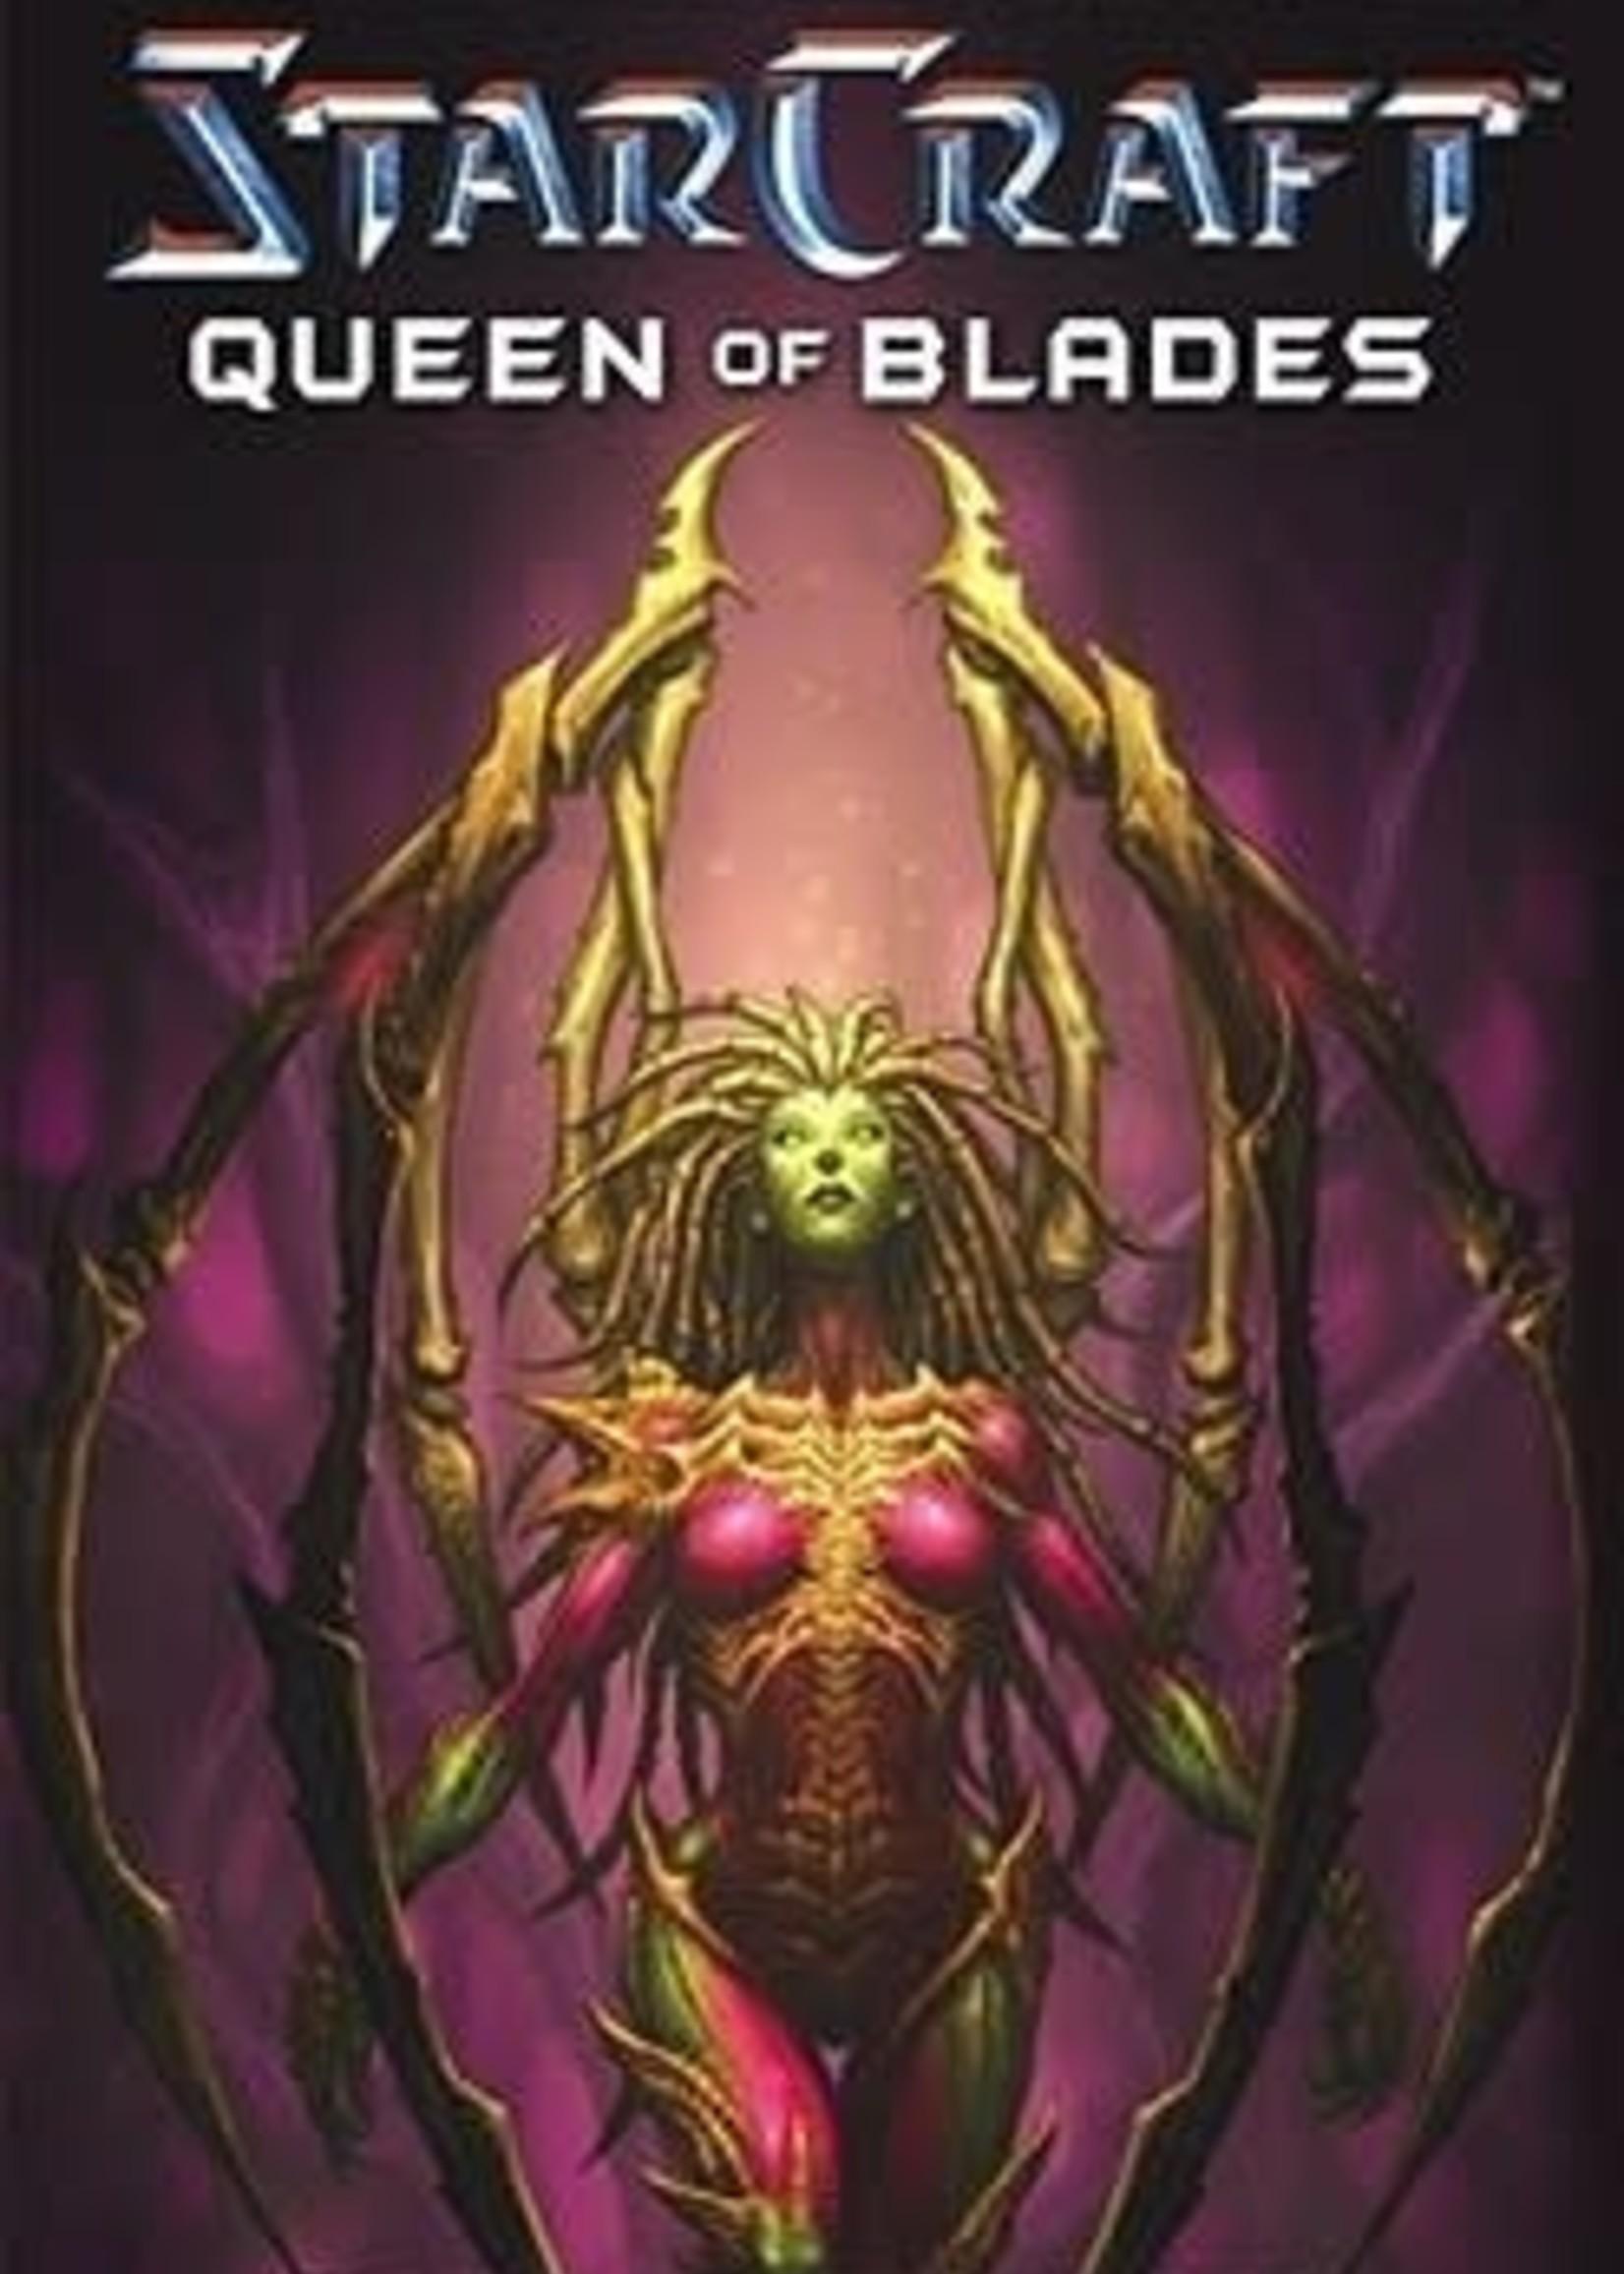 USED - Queen of Blades by Aaron Rosenberg